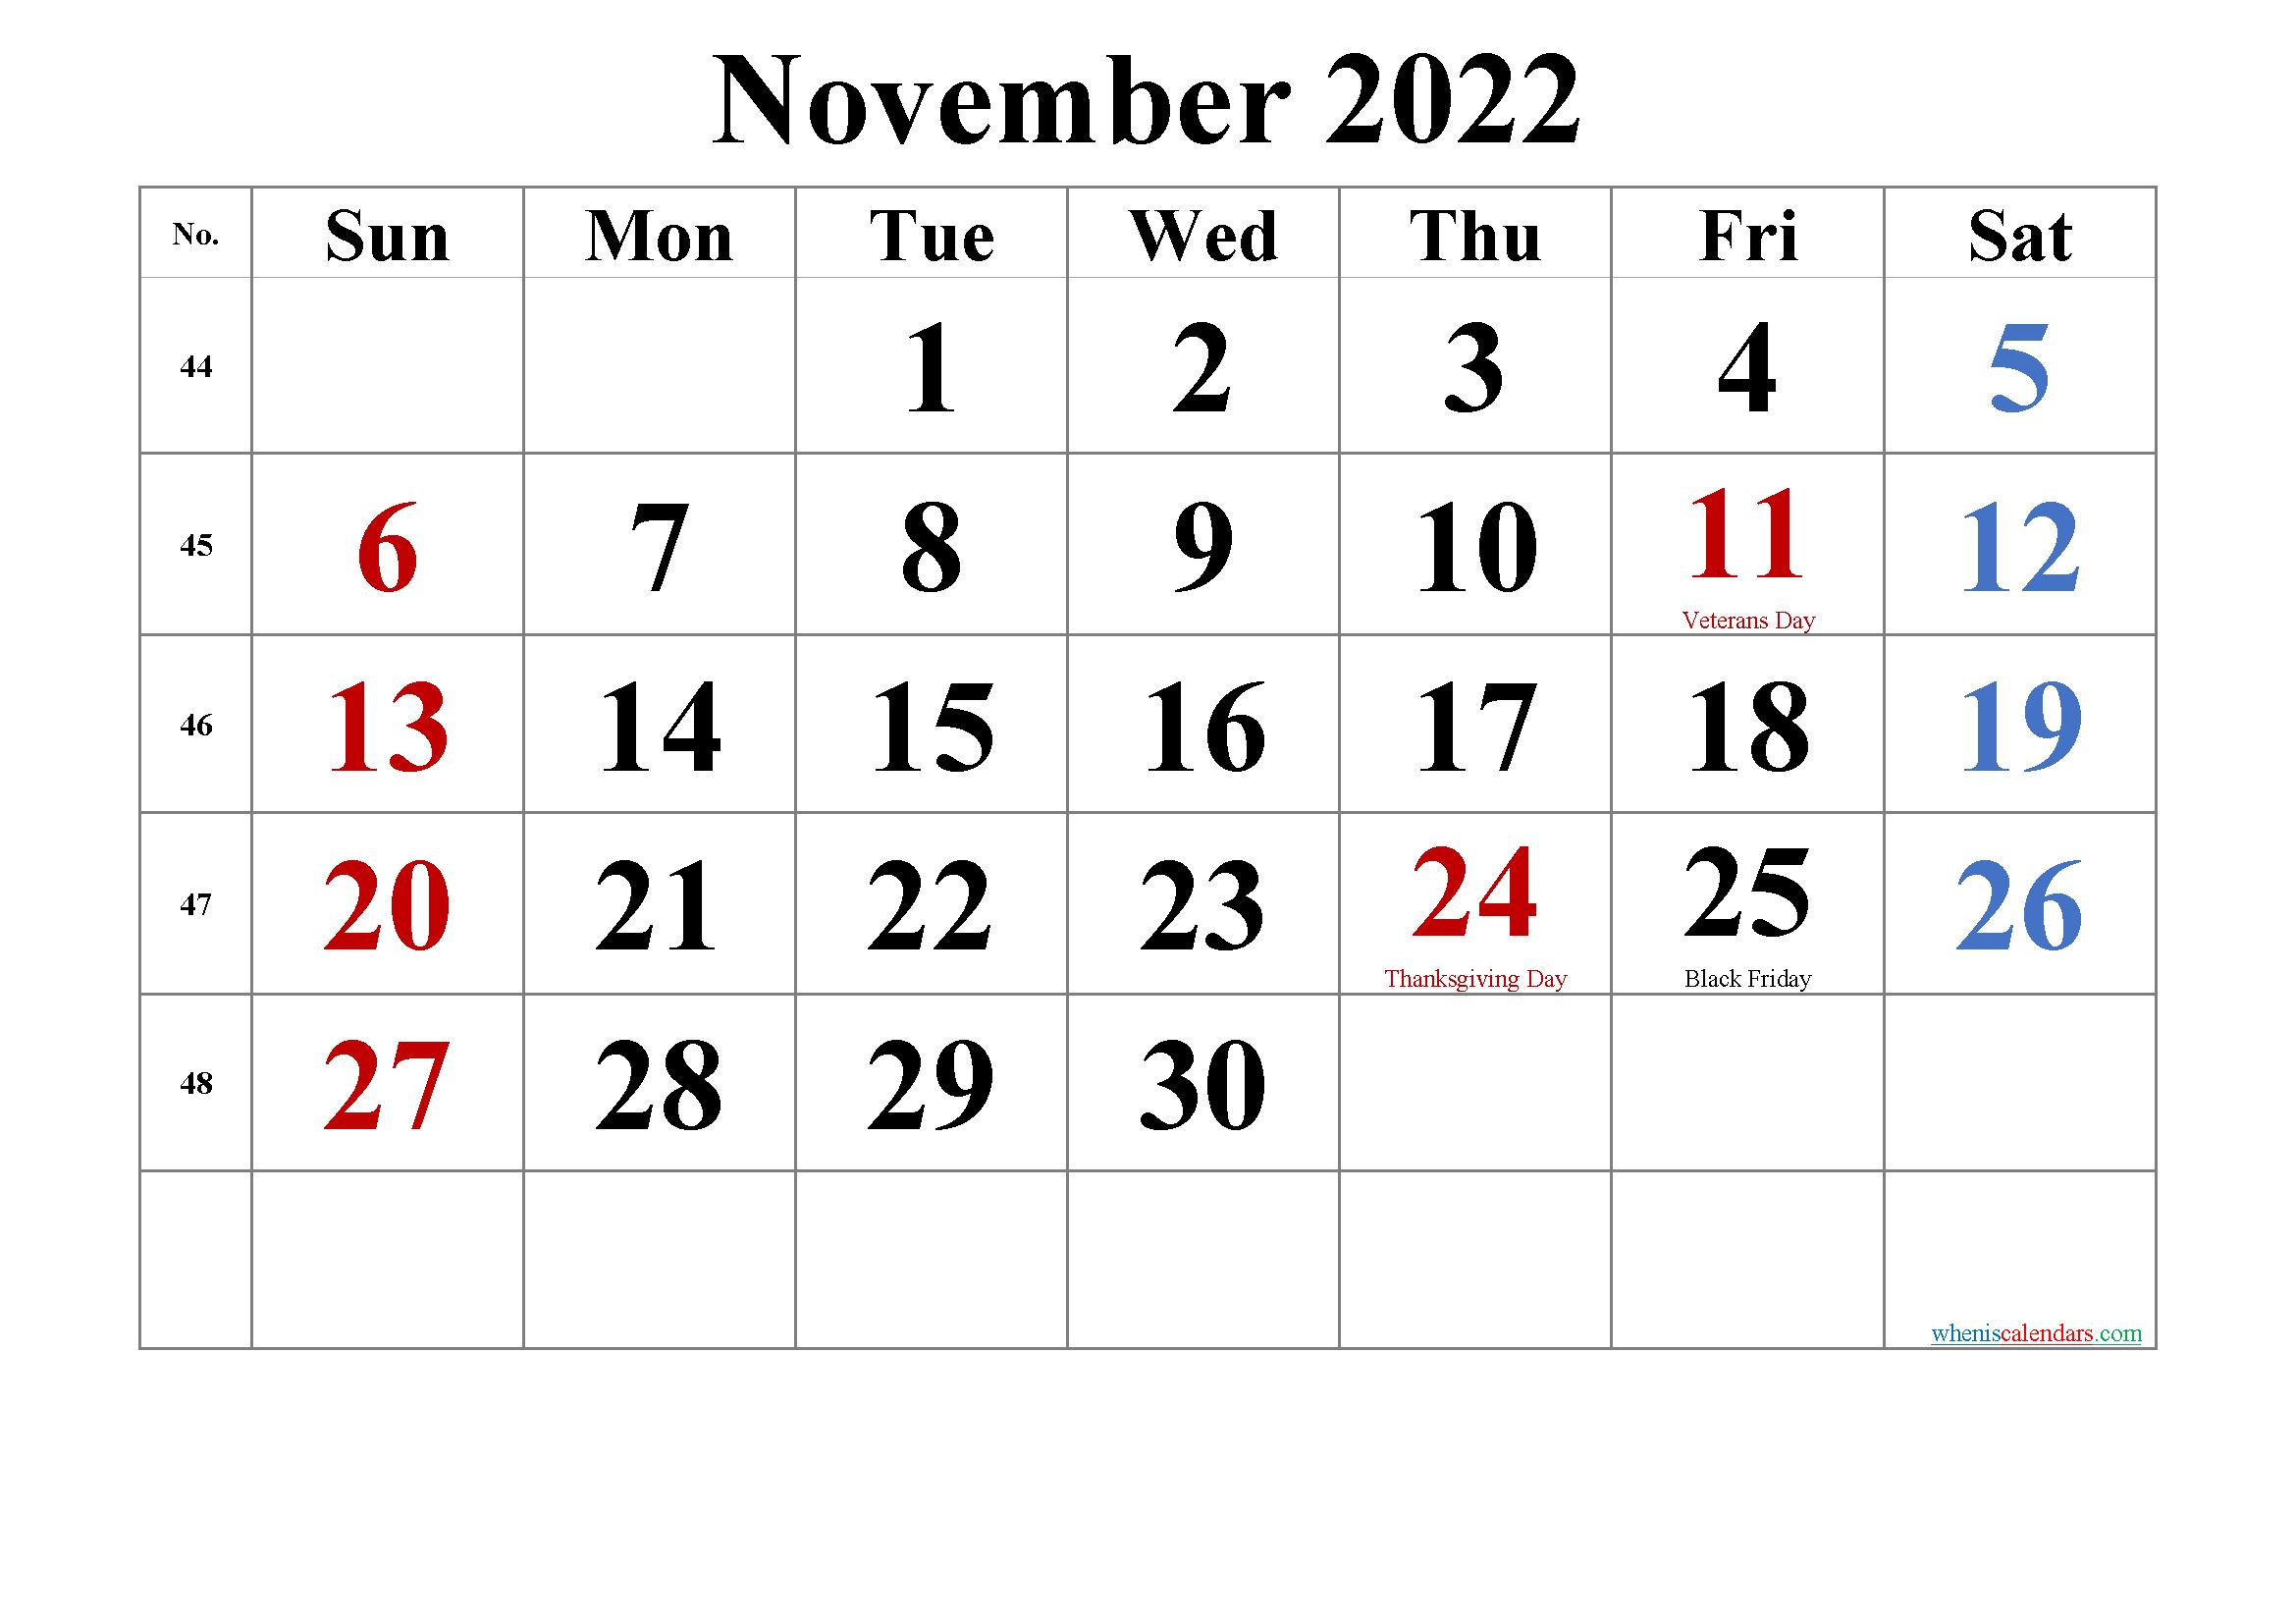 Nov 2022 Calendar With Holidays.Free Printable November 2022 Calendar Calendar Printables Monthly Calendar Printable Printable Calendar